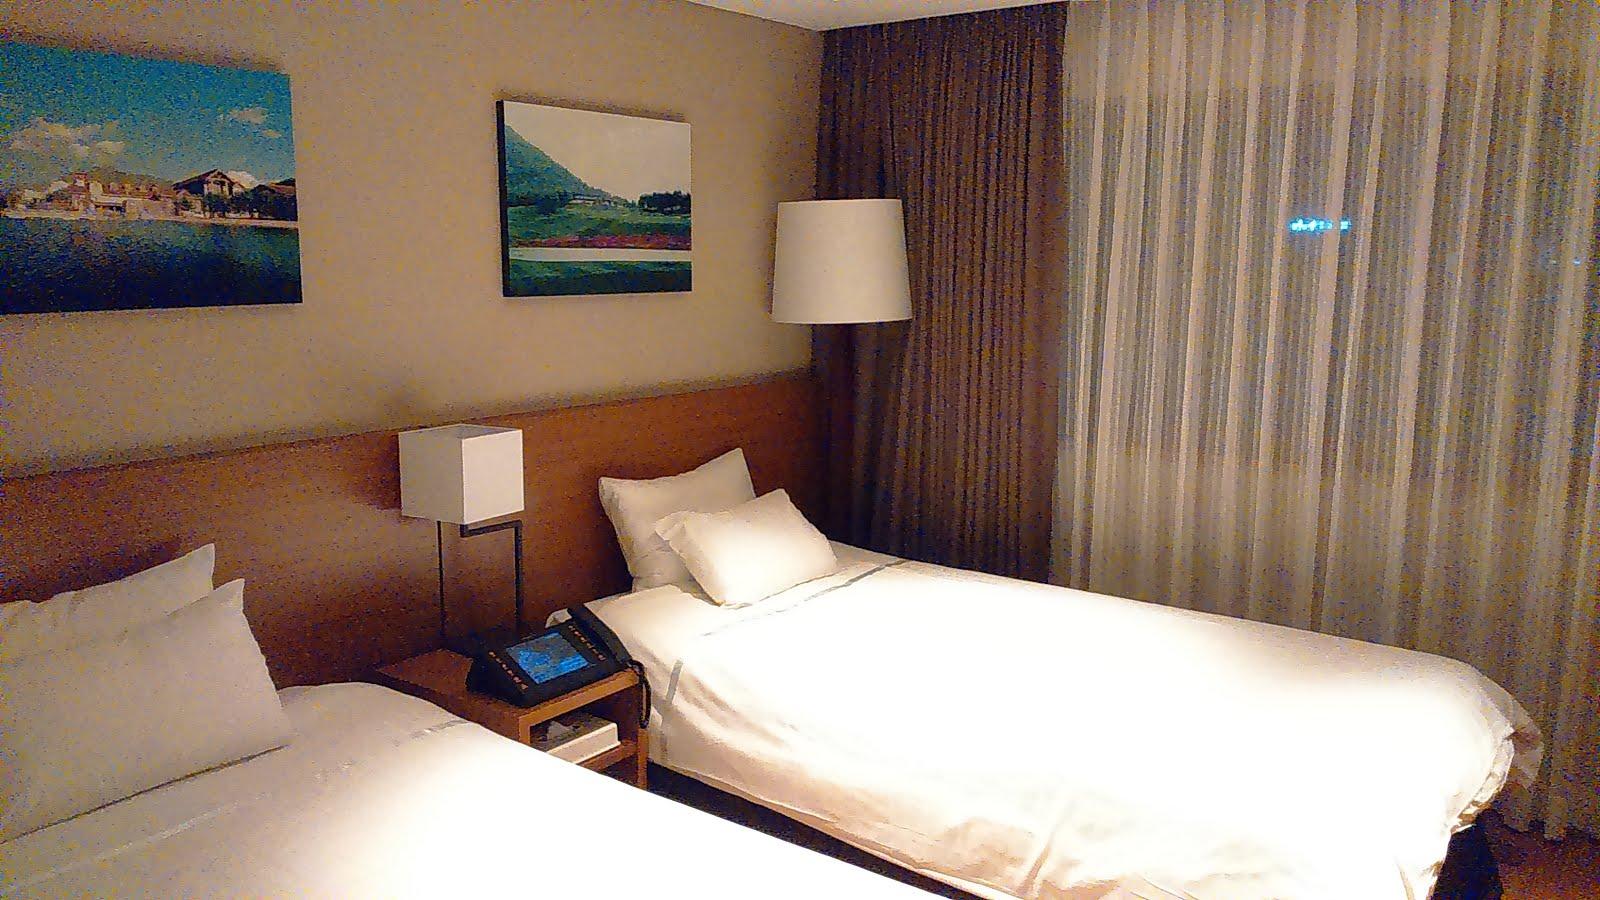 yongpyong ski resort review blog | last minute best travel deals